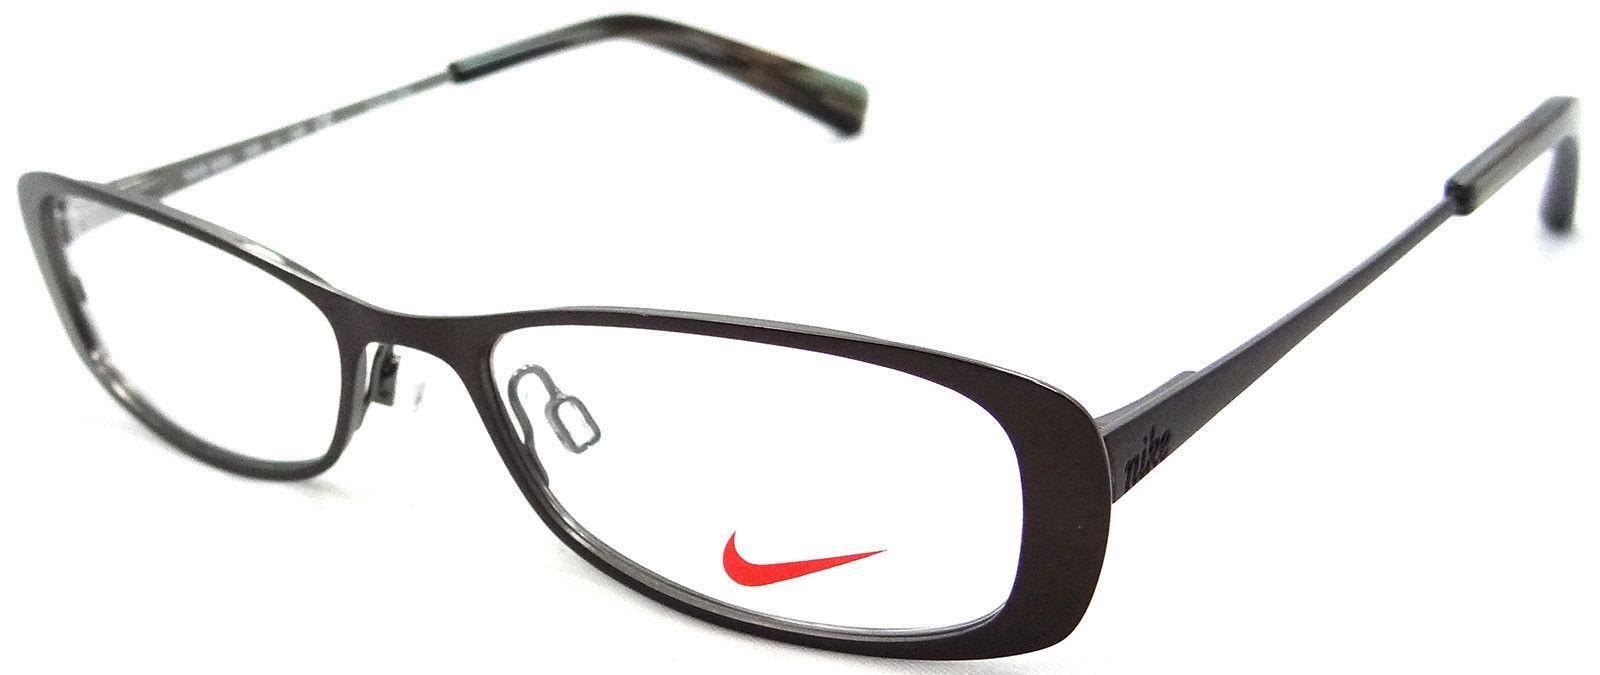 Eyeglass Frames For Petite Faces : NIKE RX EYEGLASSES FRAMES 5569 246 46X16 COFFEE SMALL ...